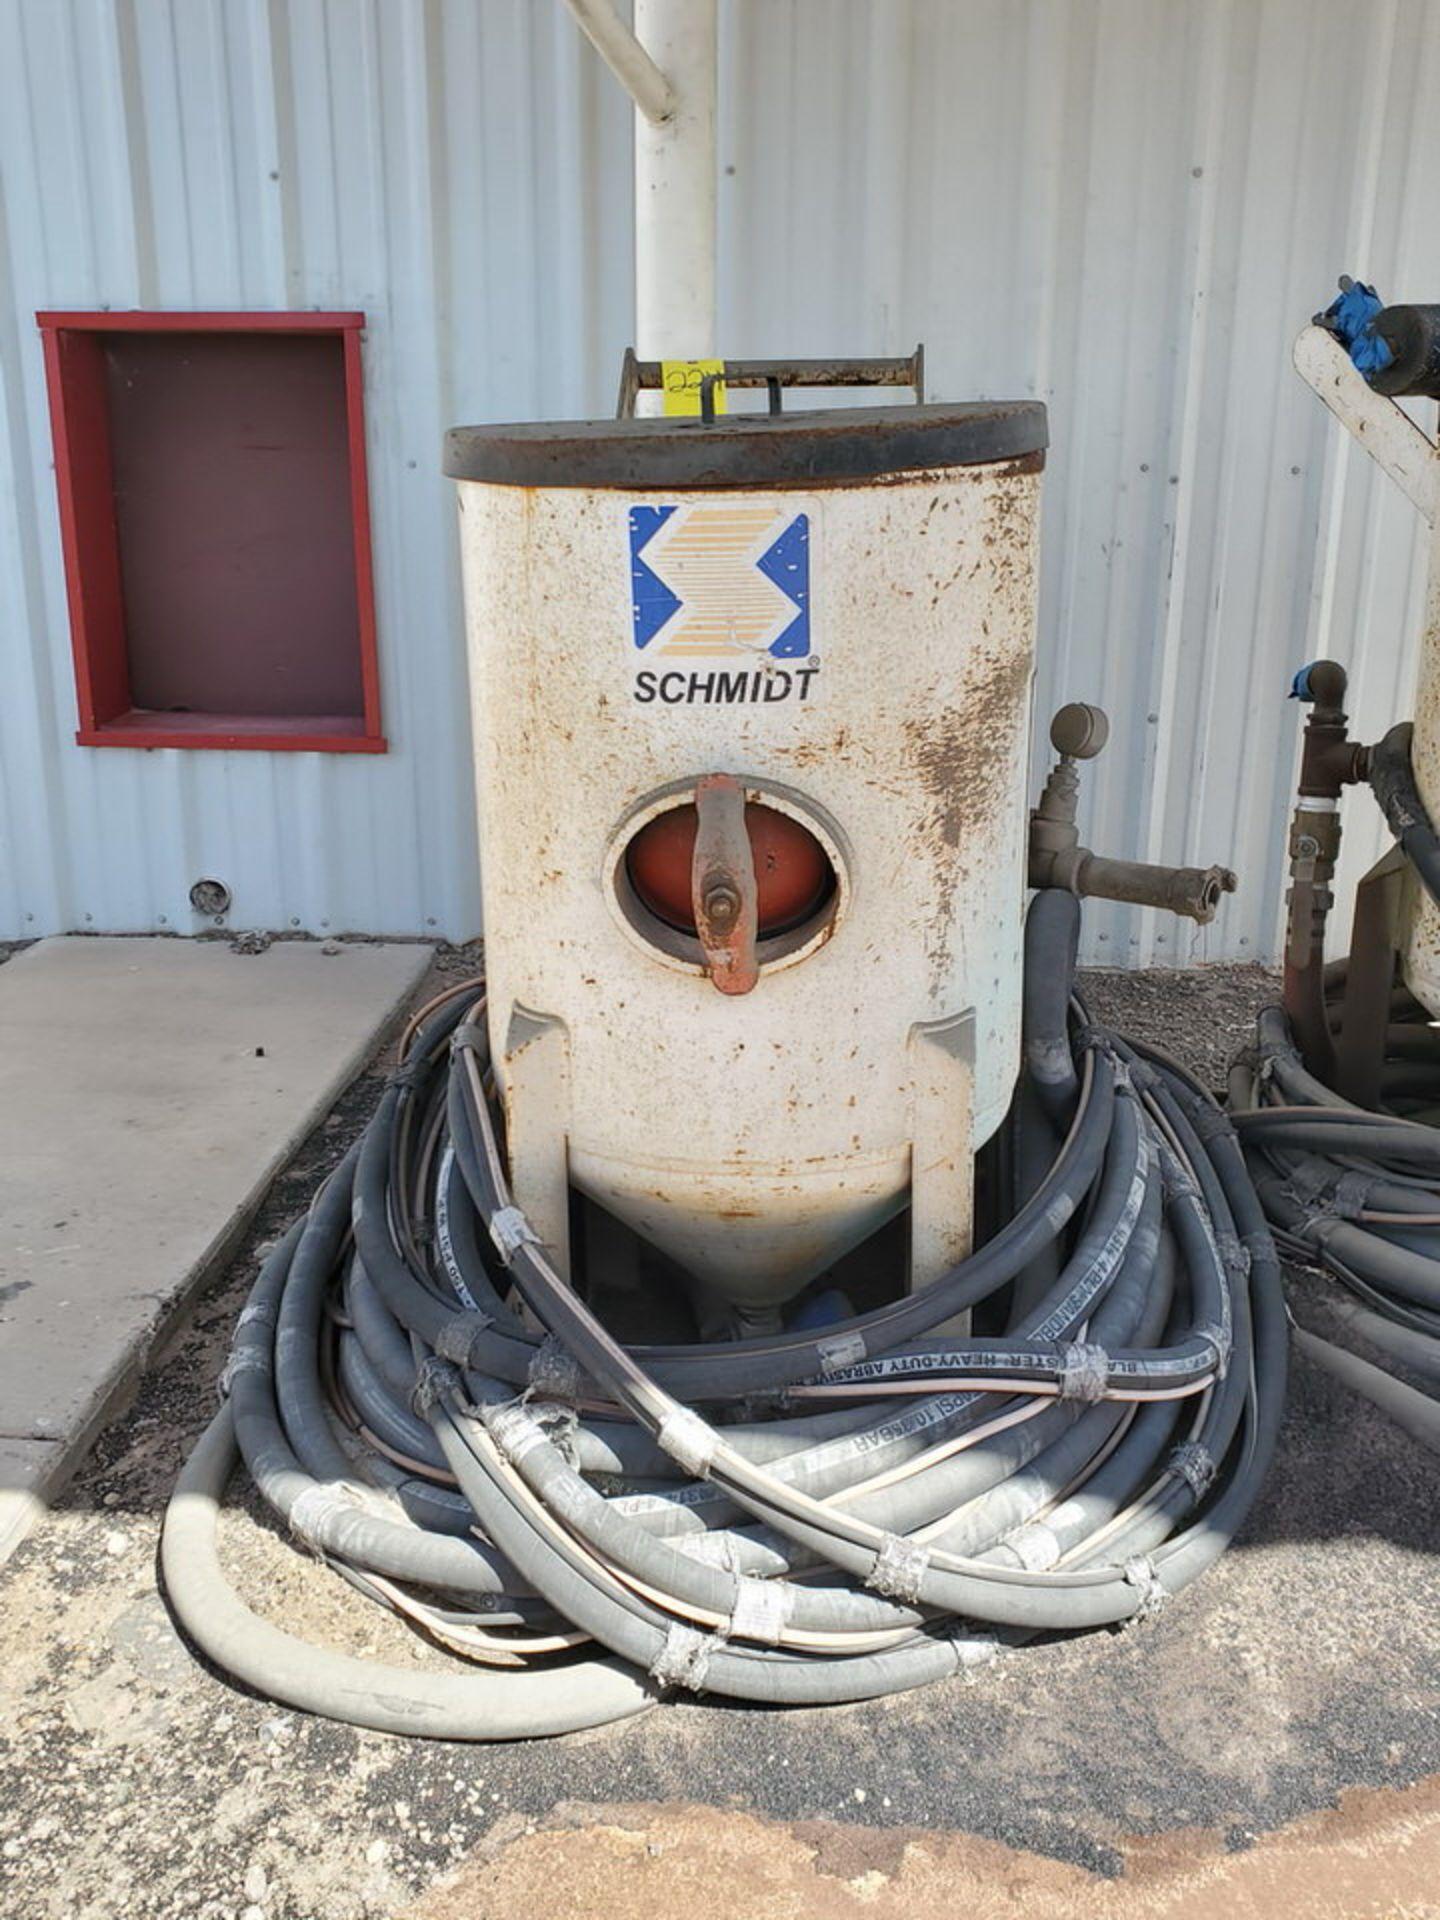 Schmidt 12' Portable Abrasive Sand Blaster Pot 150psi@250F, -20F@150psi; NB# 10649 - Image 2 of 9